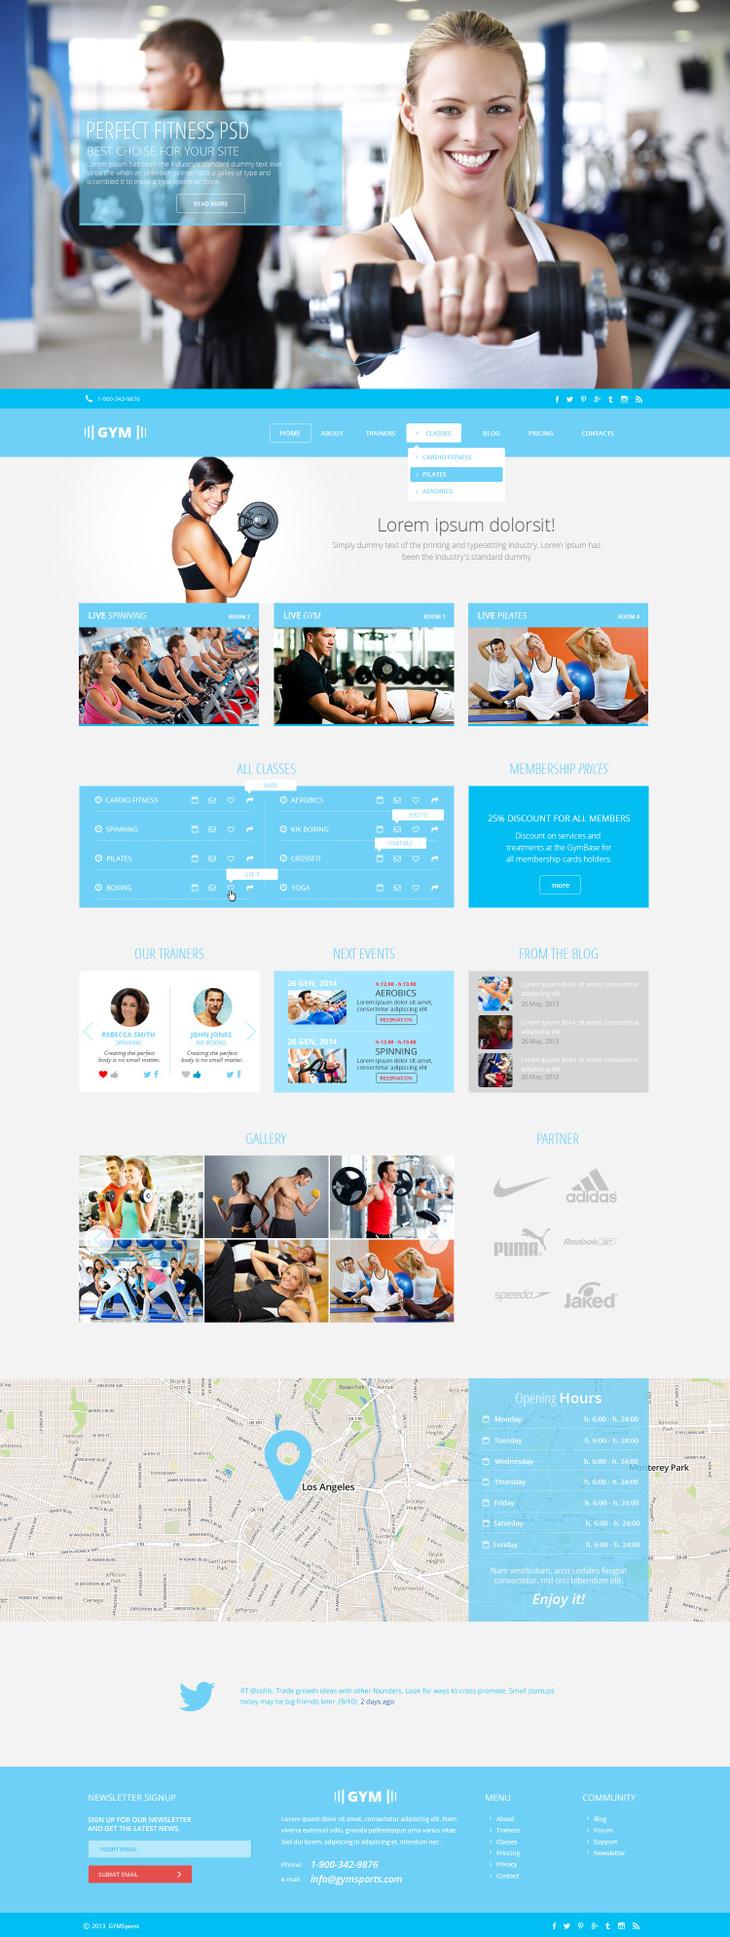 Gym Sports Free PSD Template